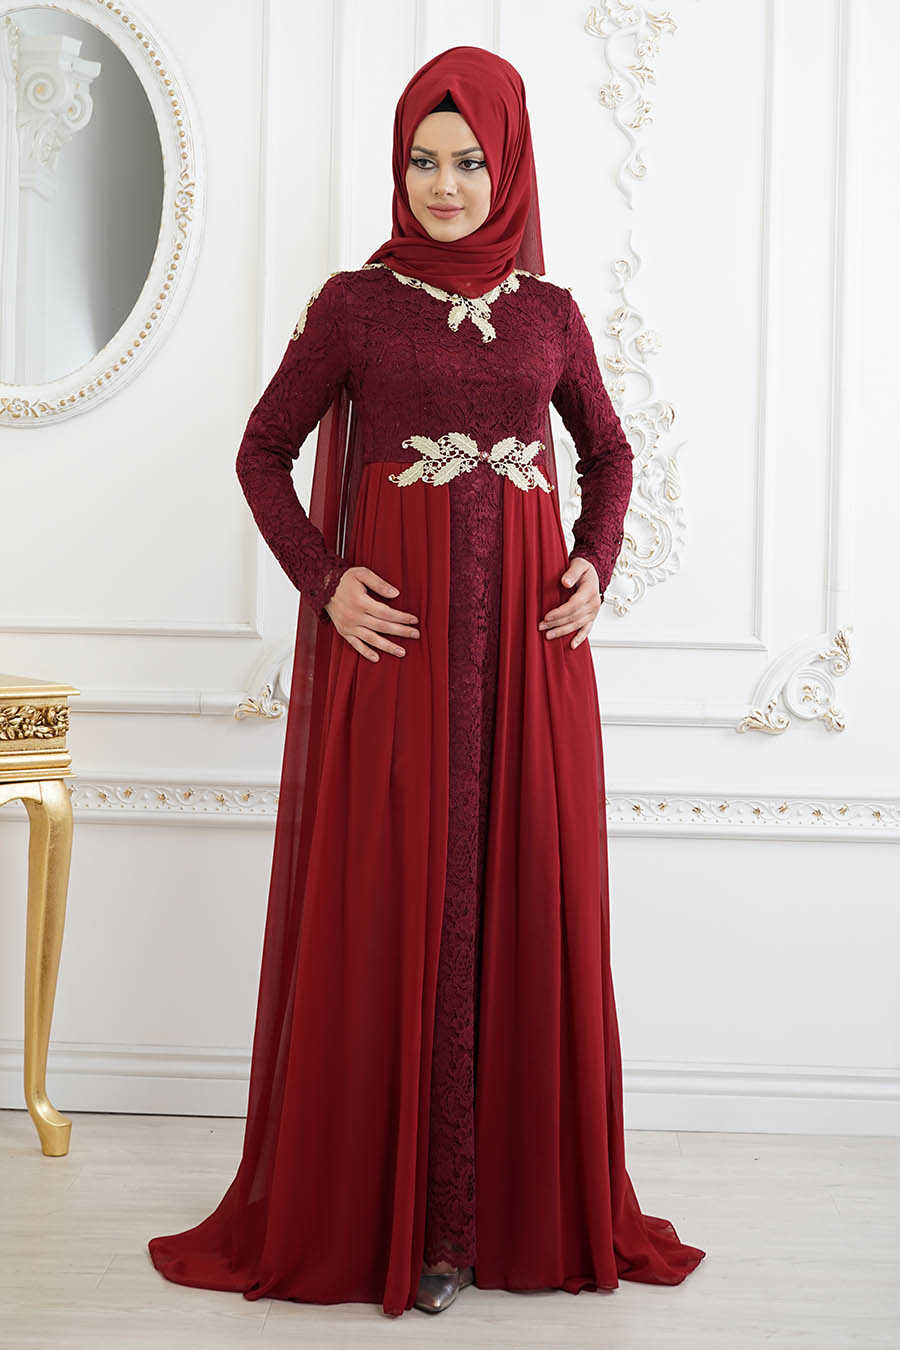 Claret Red Hijab Evening Dress 8110BR